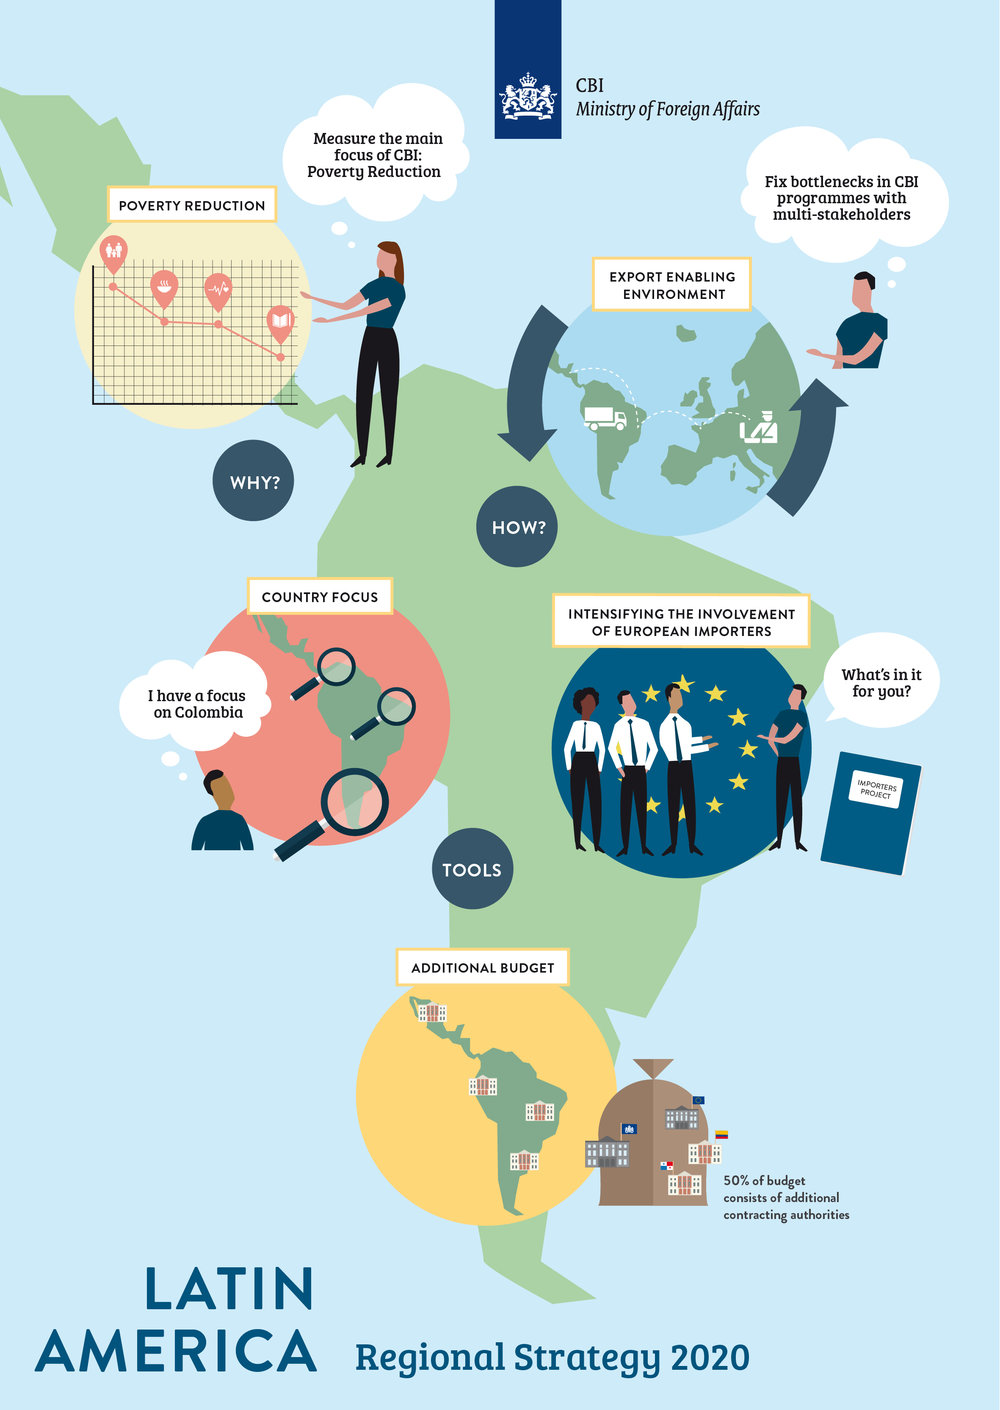 Illustration Poster Design Latin America Regional Stratagy 2020 for the CBI